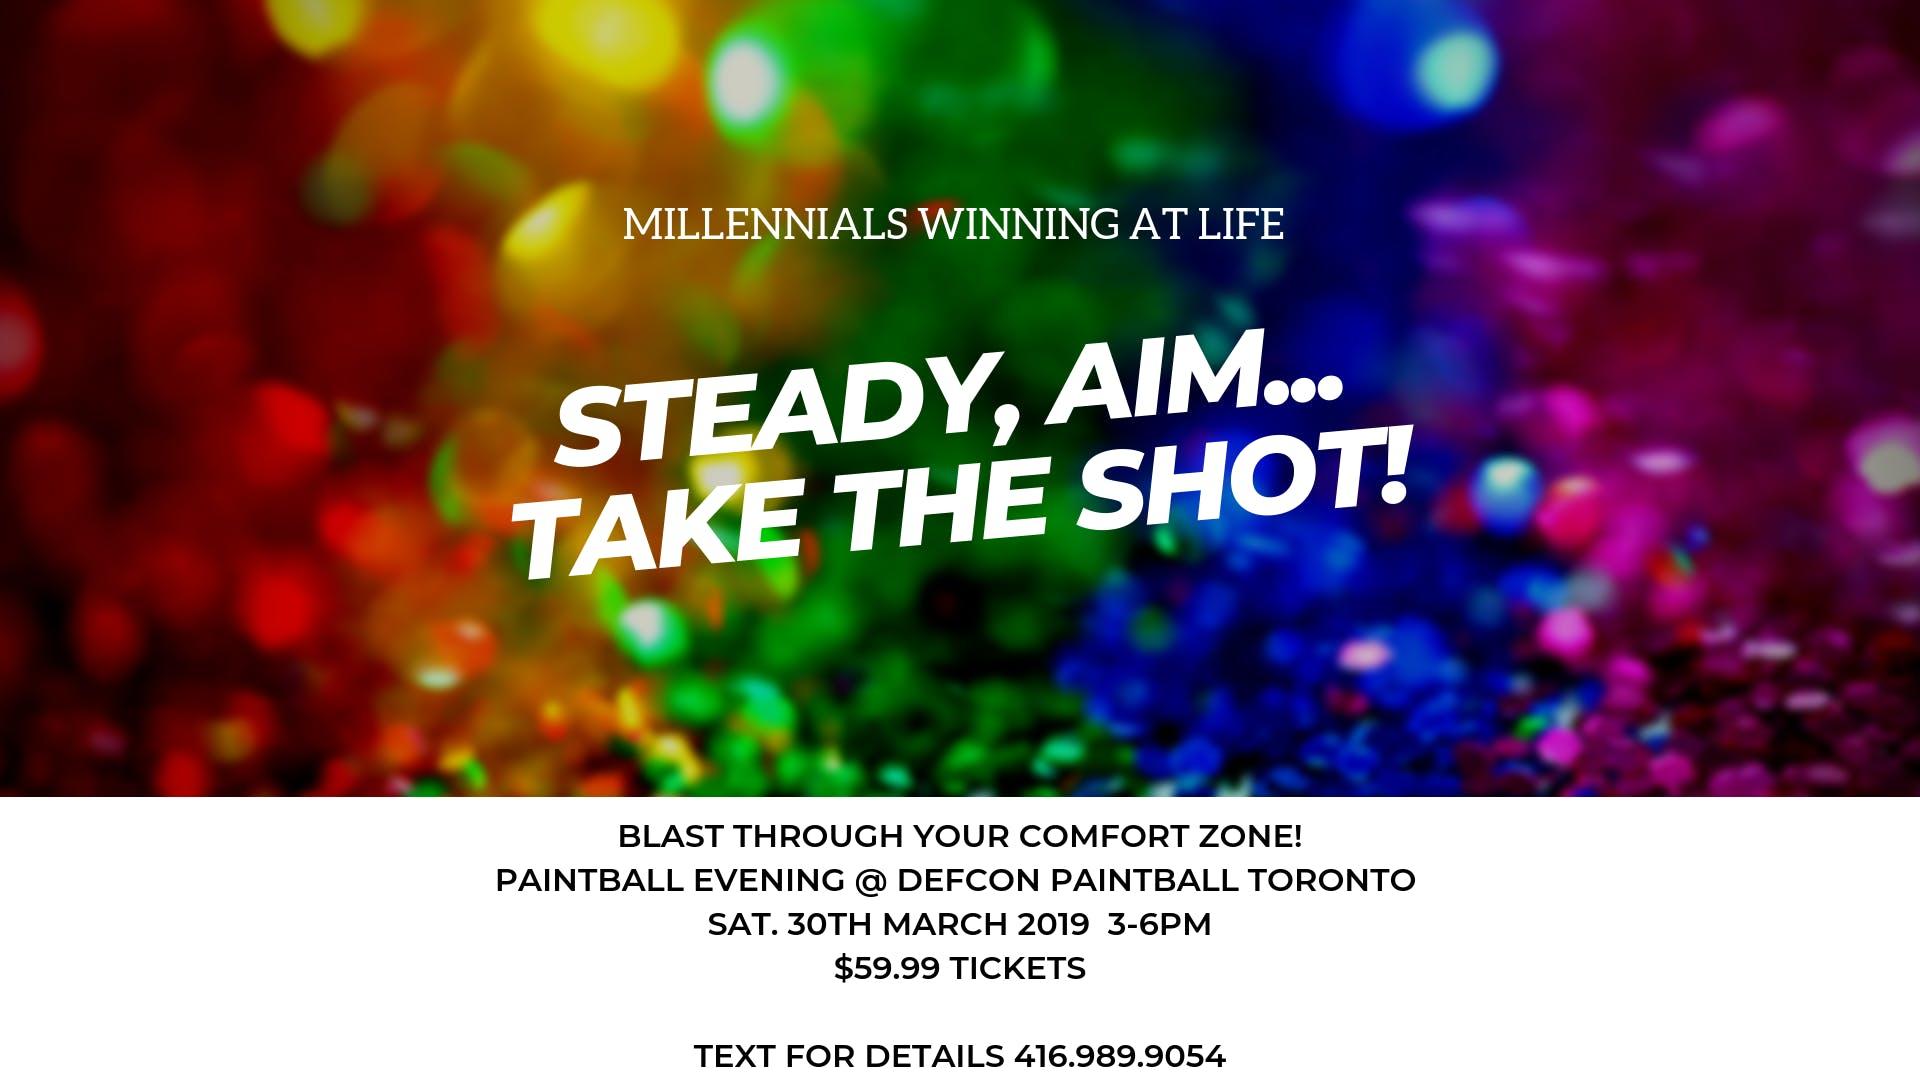 BLAST Through Your Comfort Zone: Millennial Paintball Evening - 30